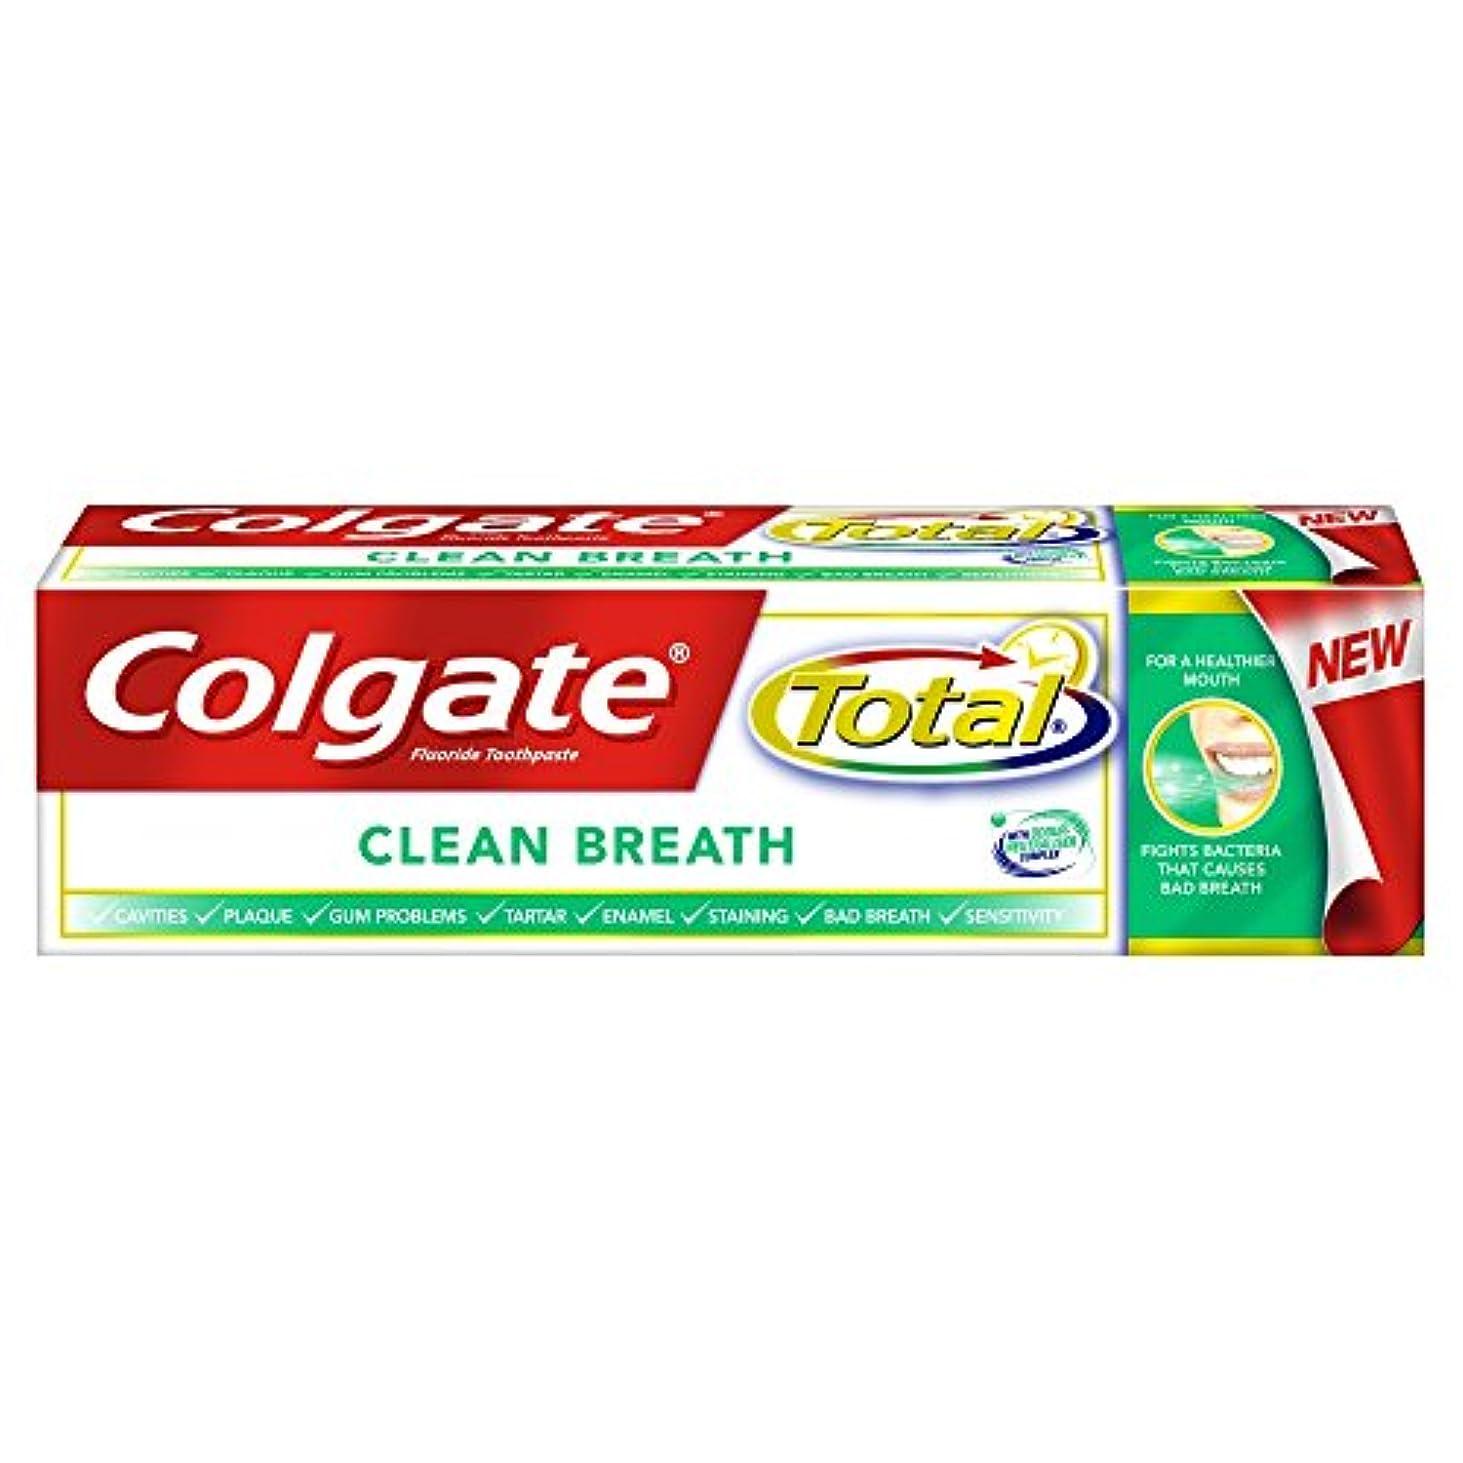 [Colgate ] コルゲートトータルプレミアムクリーン息歯磨き粉75ミリリットル - Colgate Total Premium Clean Breath Toothpaste 75Ml [並行輸入品]